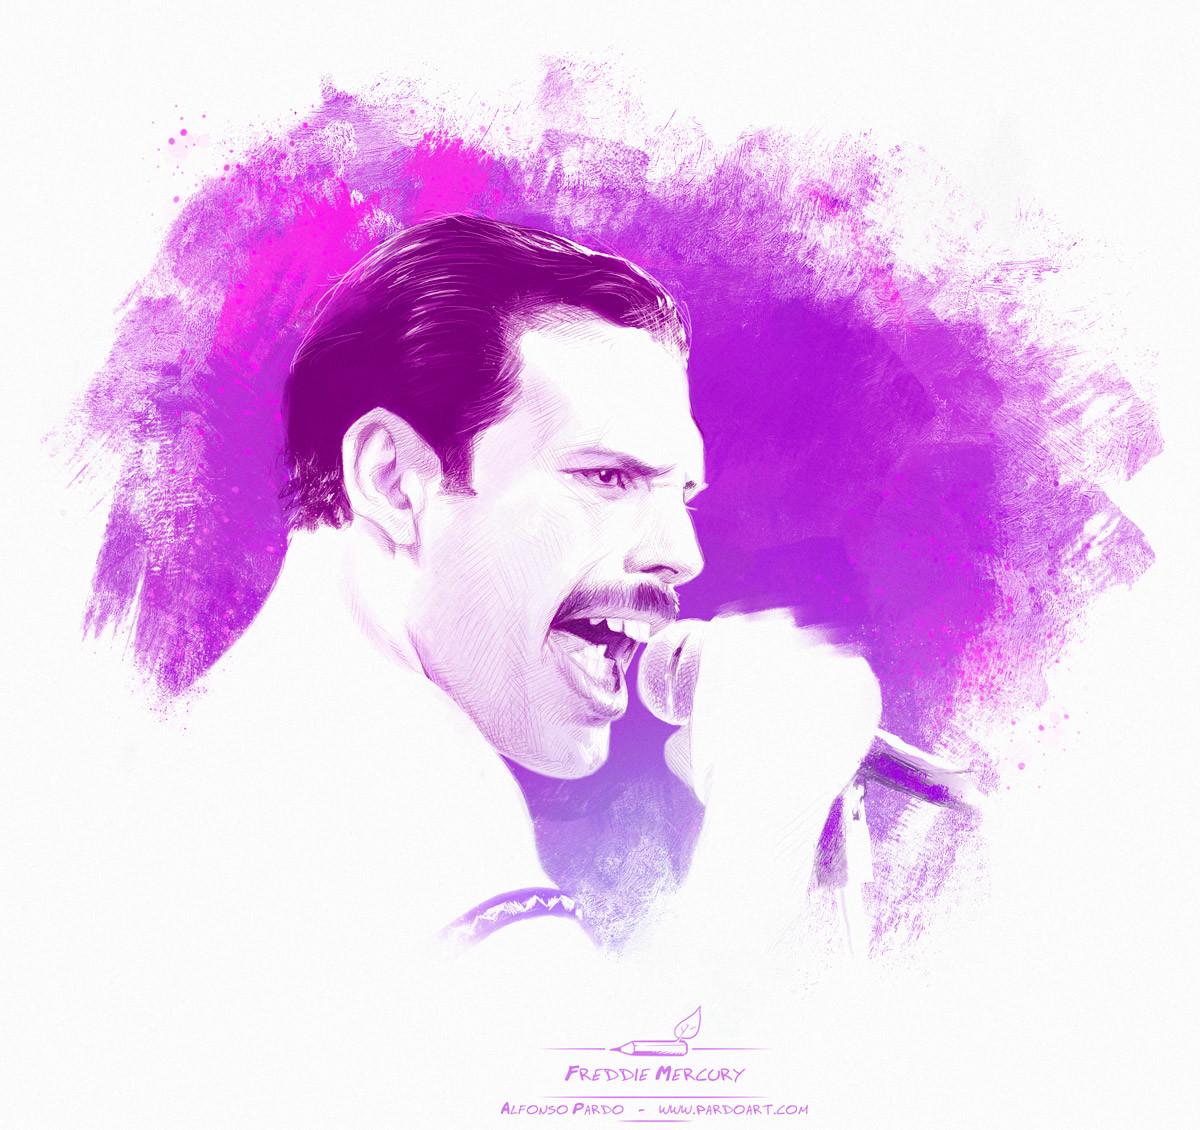 Gods - Freddie Mercury